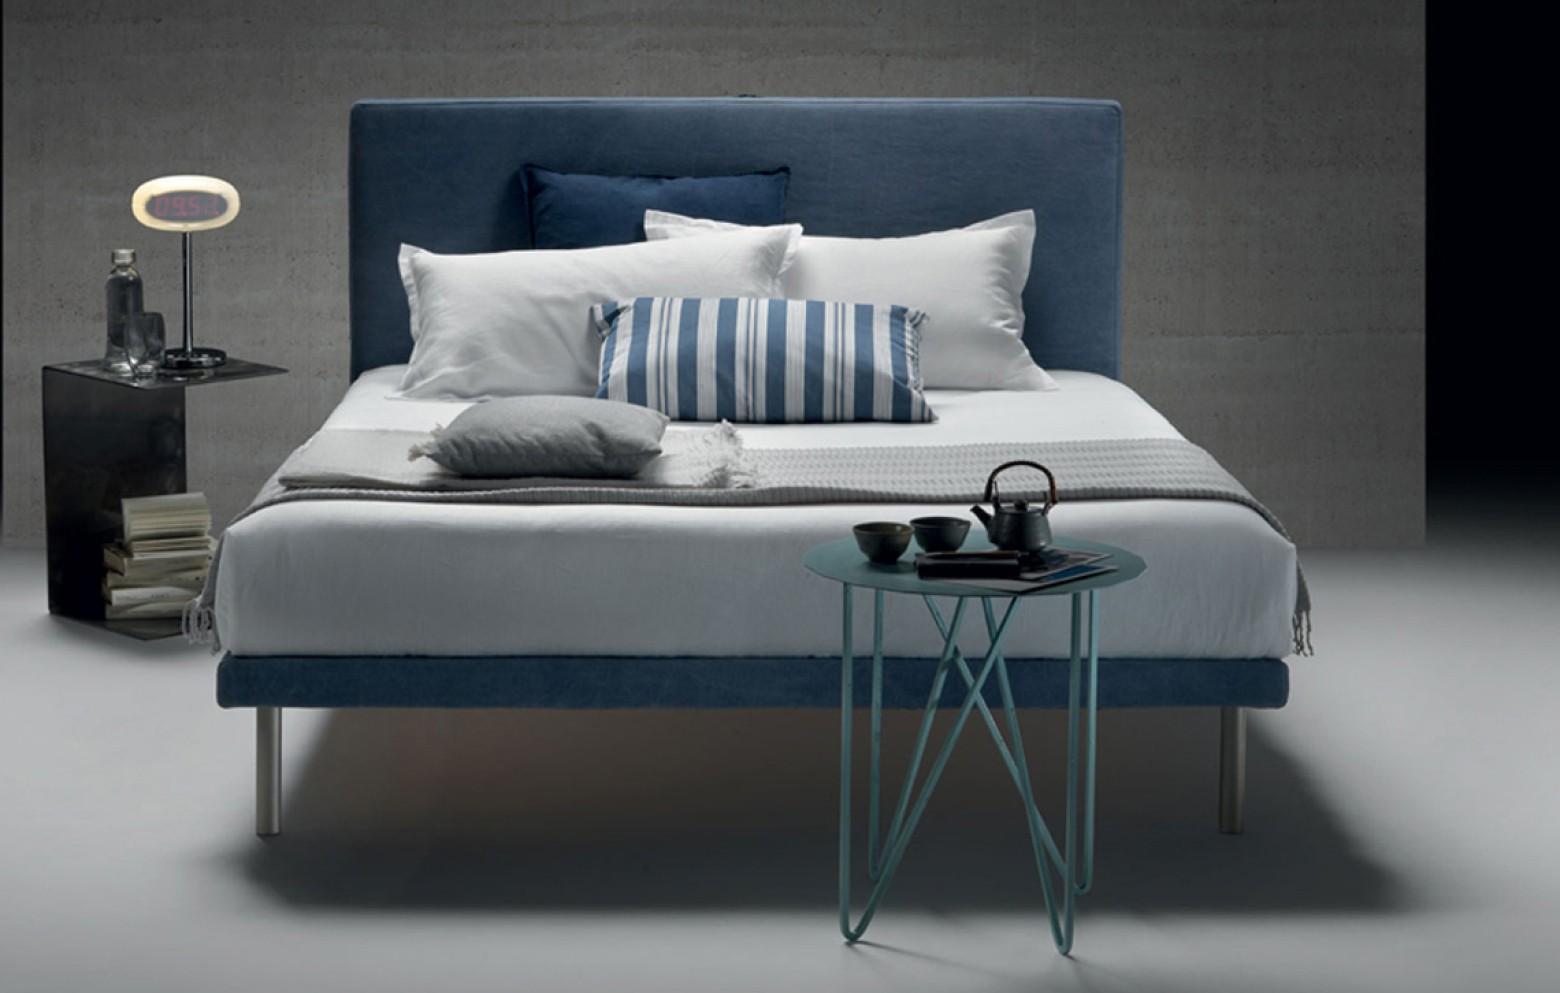 zip | betten | betten & schränke | who's perfect., Schlafzimmer design